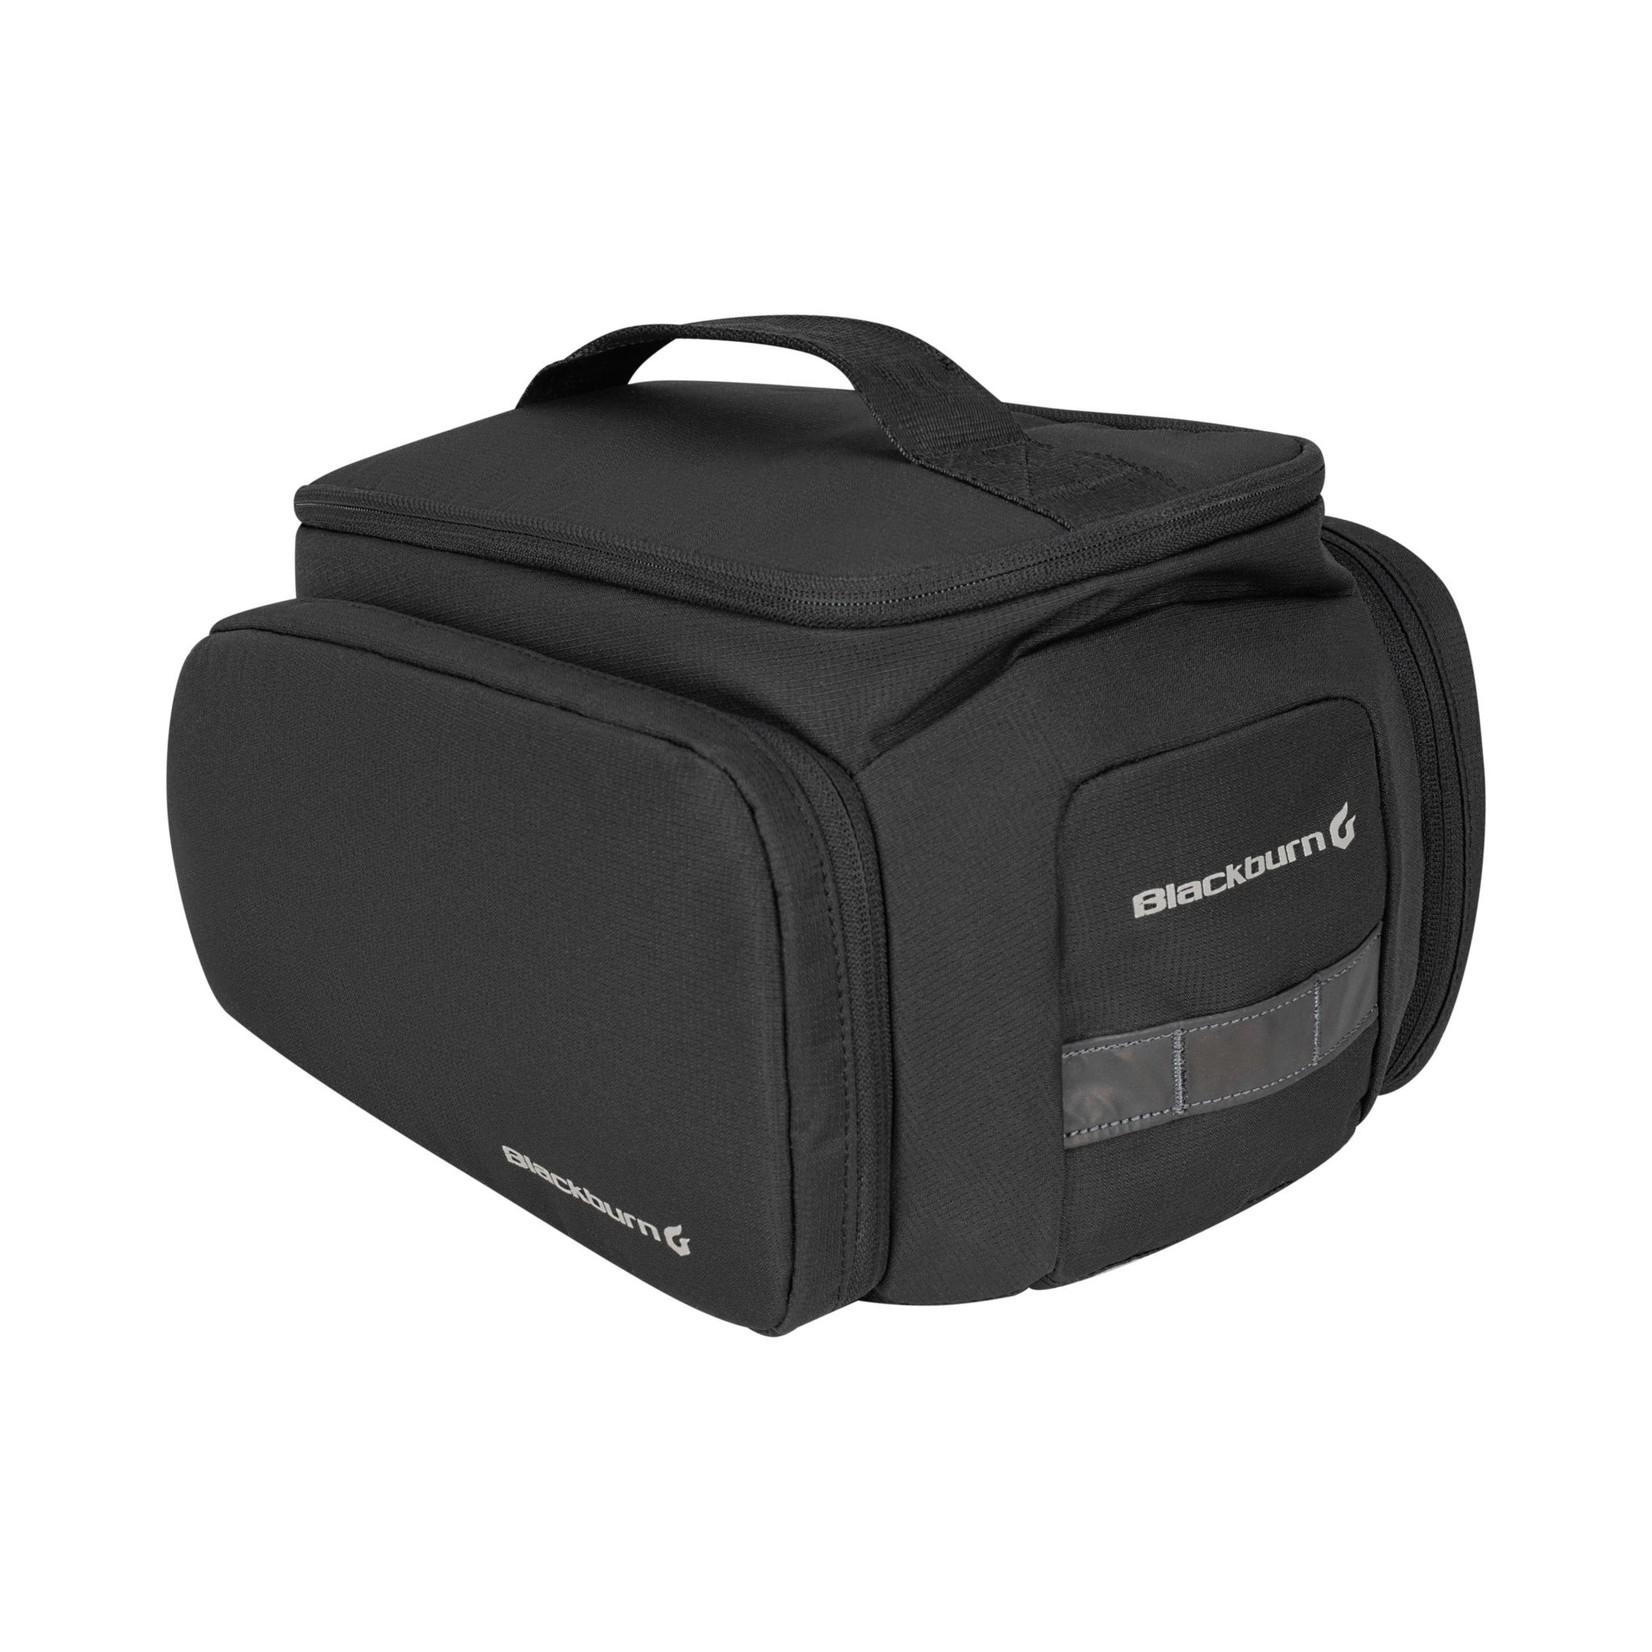 Blackburn Blackburn Local Trunk Bag - Black